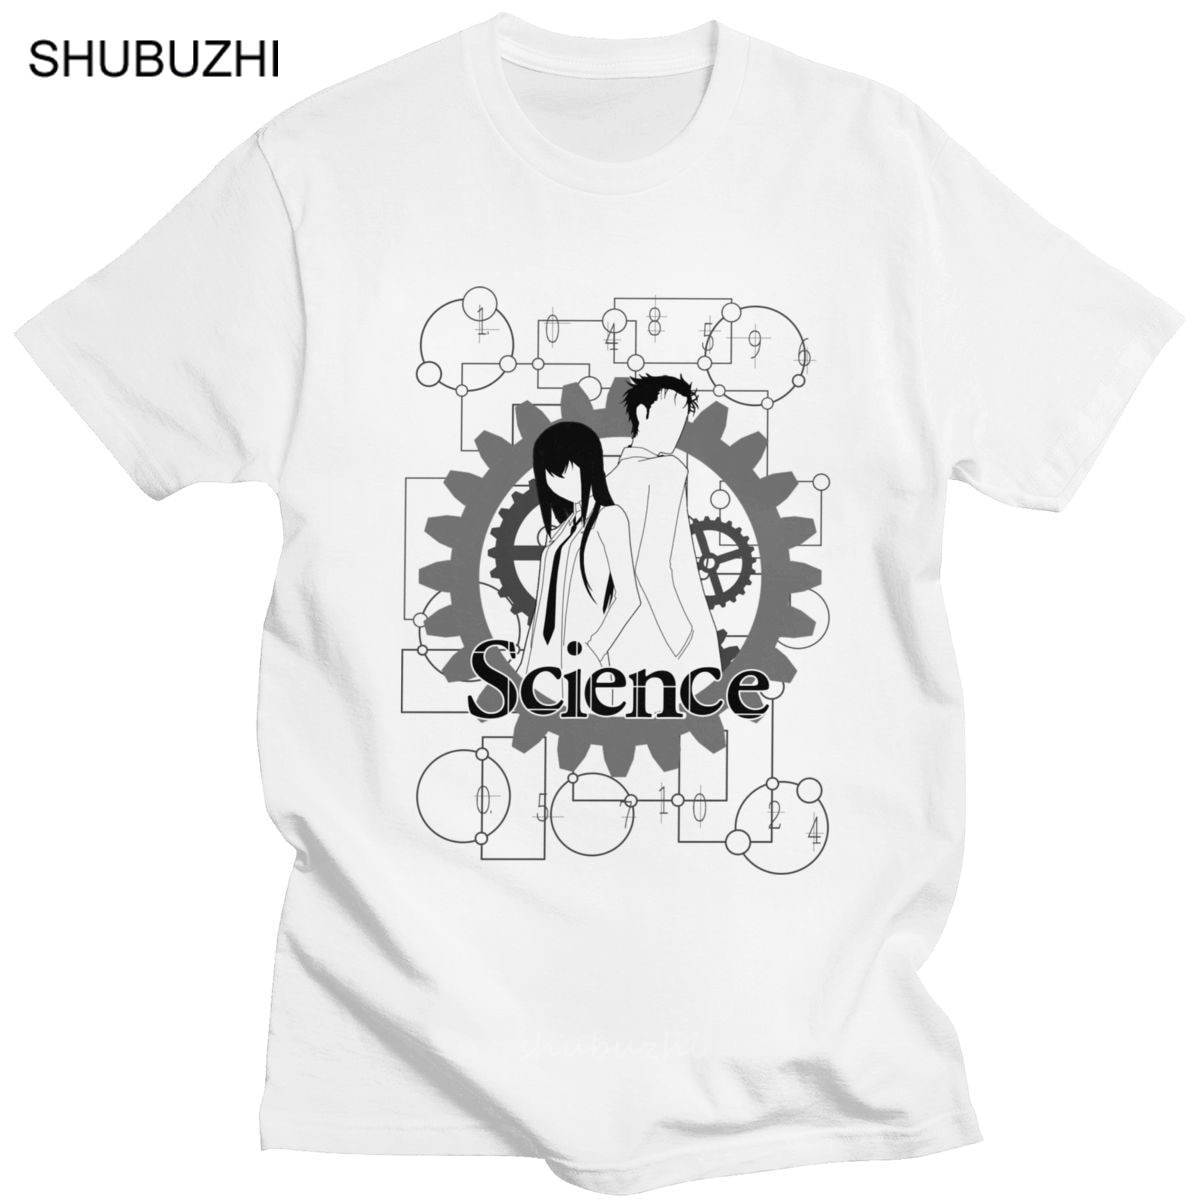 Camiseta clásica de Steins Gate para hombre, camiseta de Manga corta de Anime Okabe Mayuri Manga Daru Shiina Rintaro, Camiseta de algodón para verano